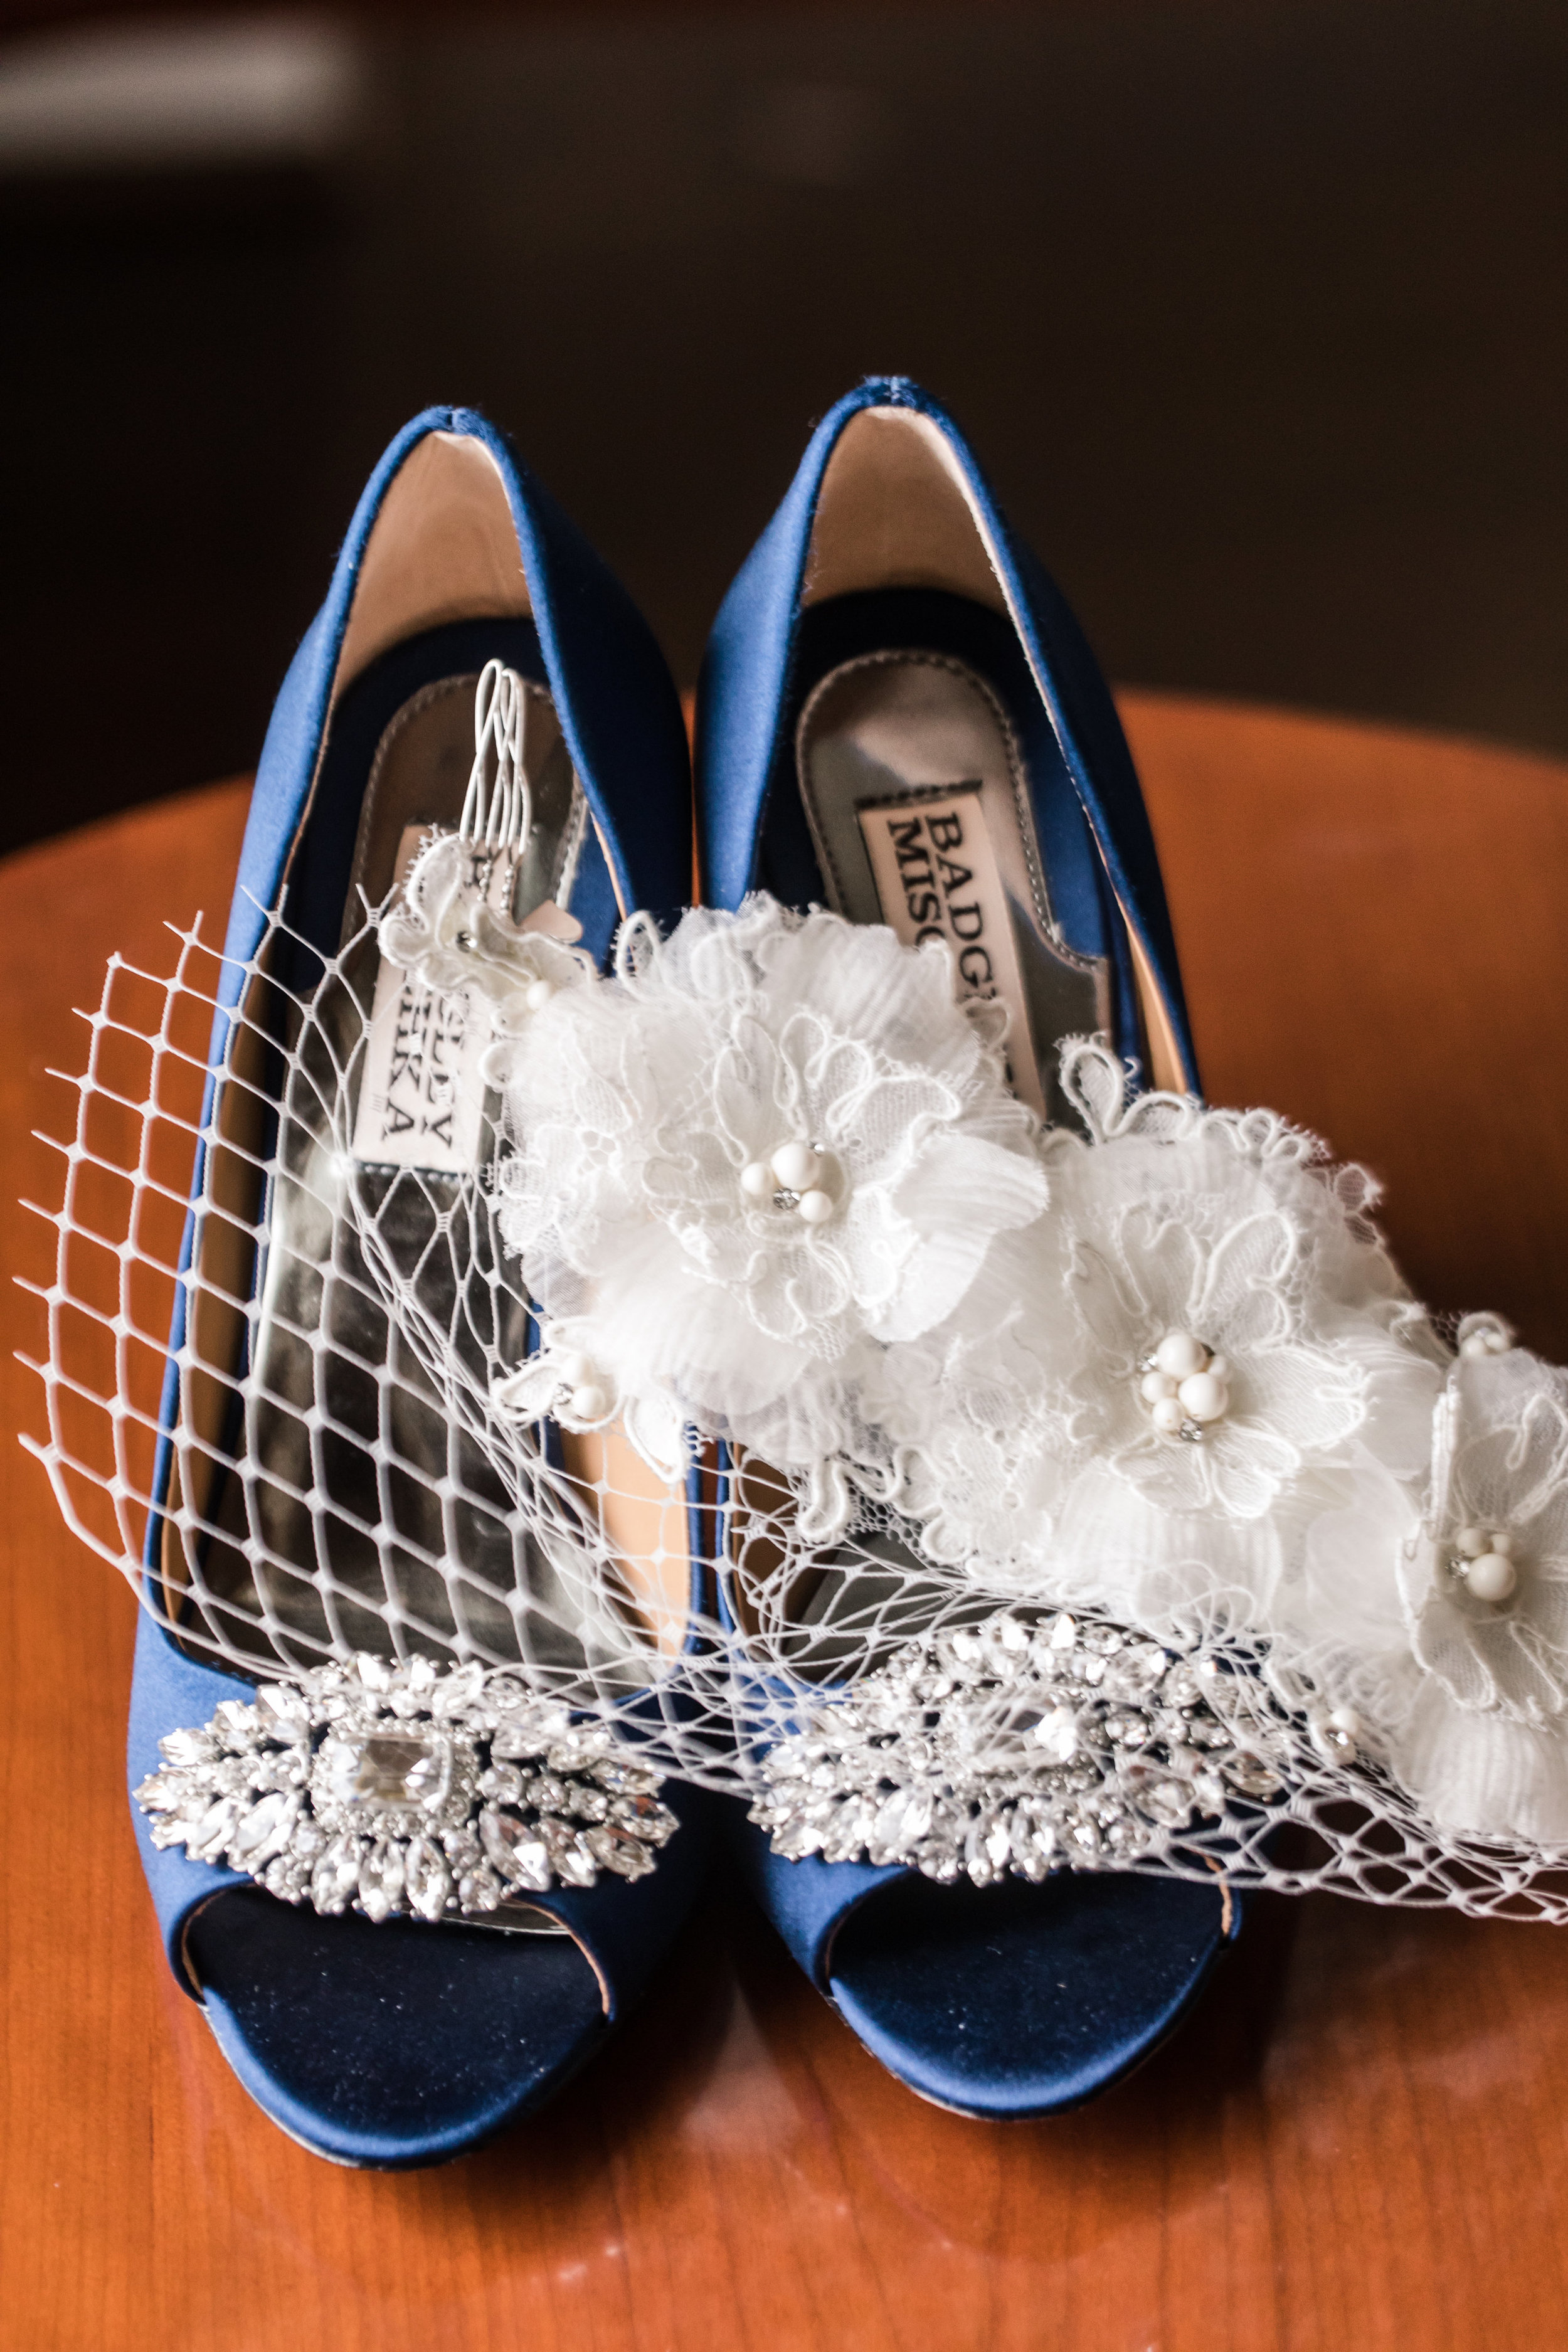 Blue Wedding Bridal Shoes - Badgley Mischka - A Classic George Washington Hotel Wedding - Photography by Marirosa